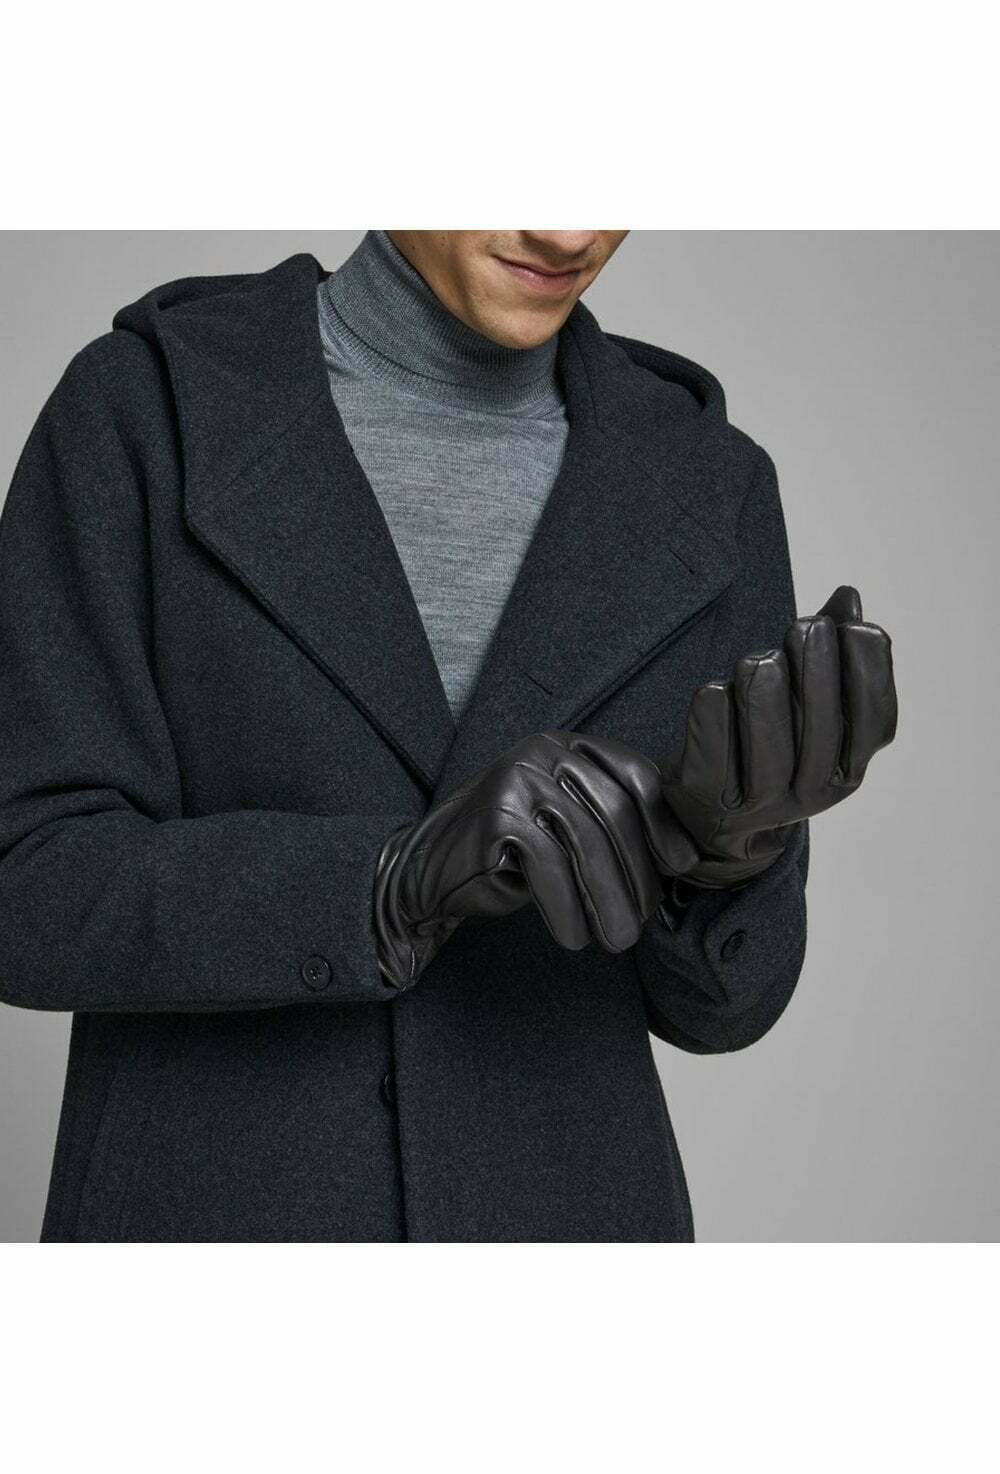 Jack And Jones Jacmontana Leather Gloves Black